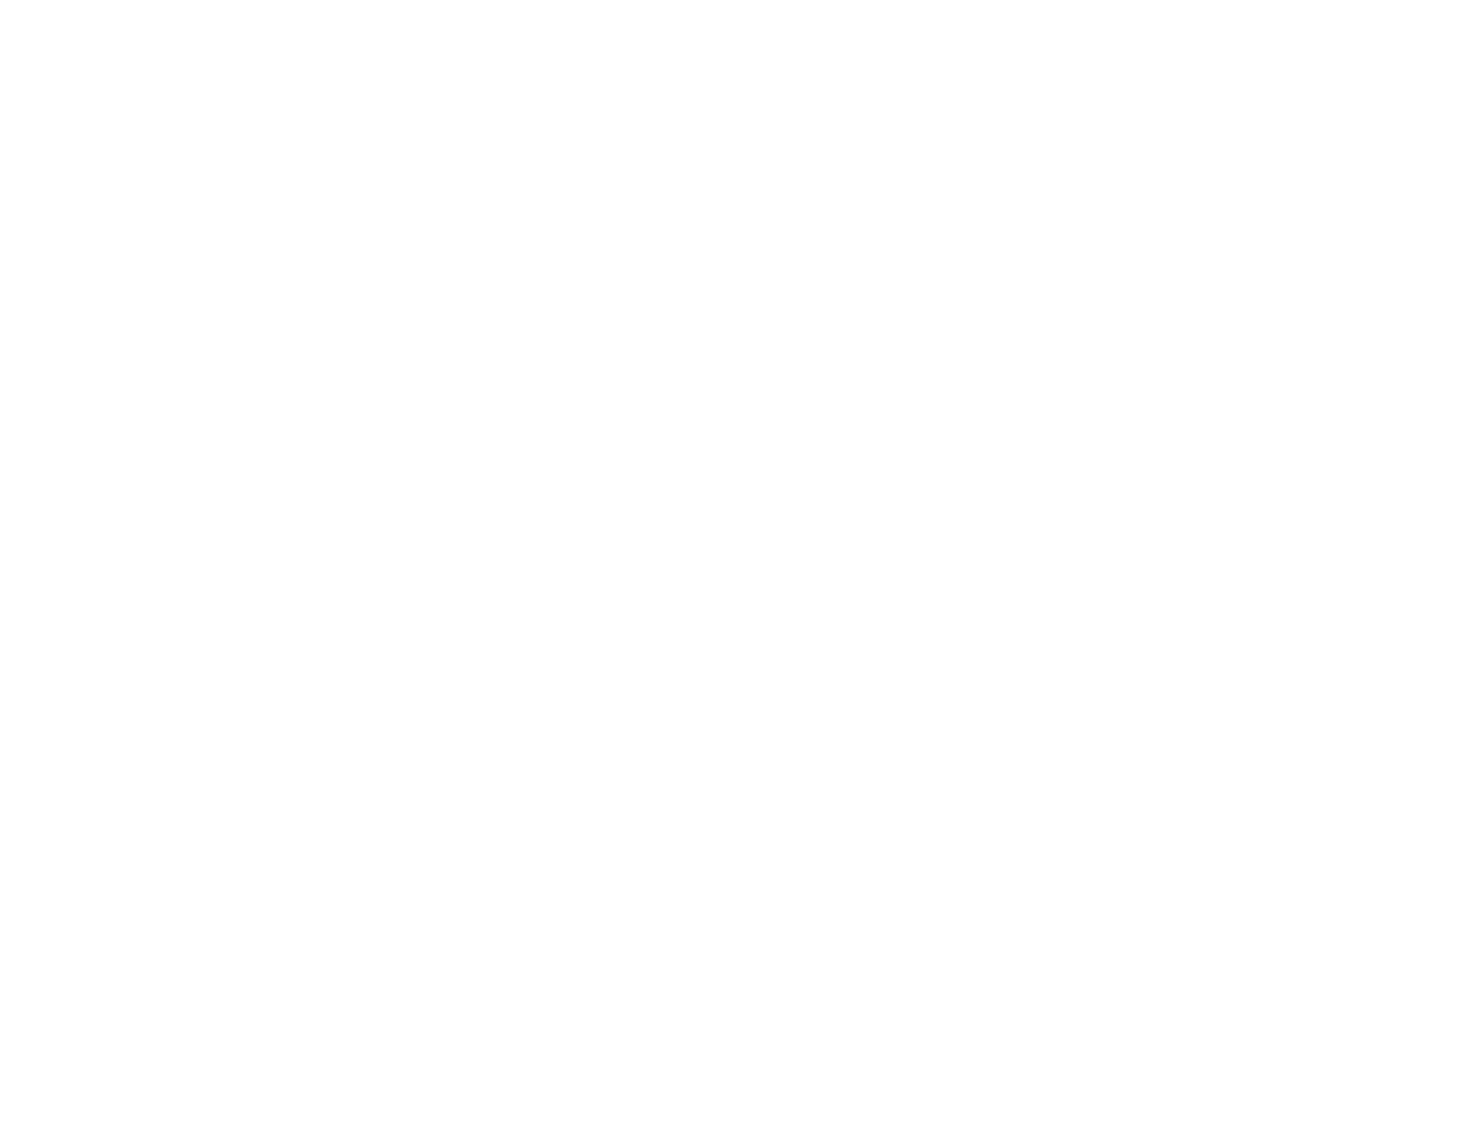 LR18 - Alcons Audio